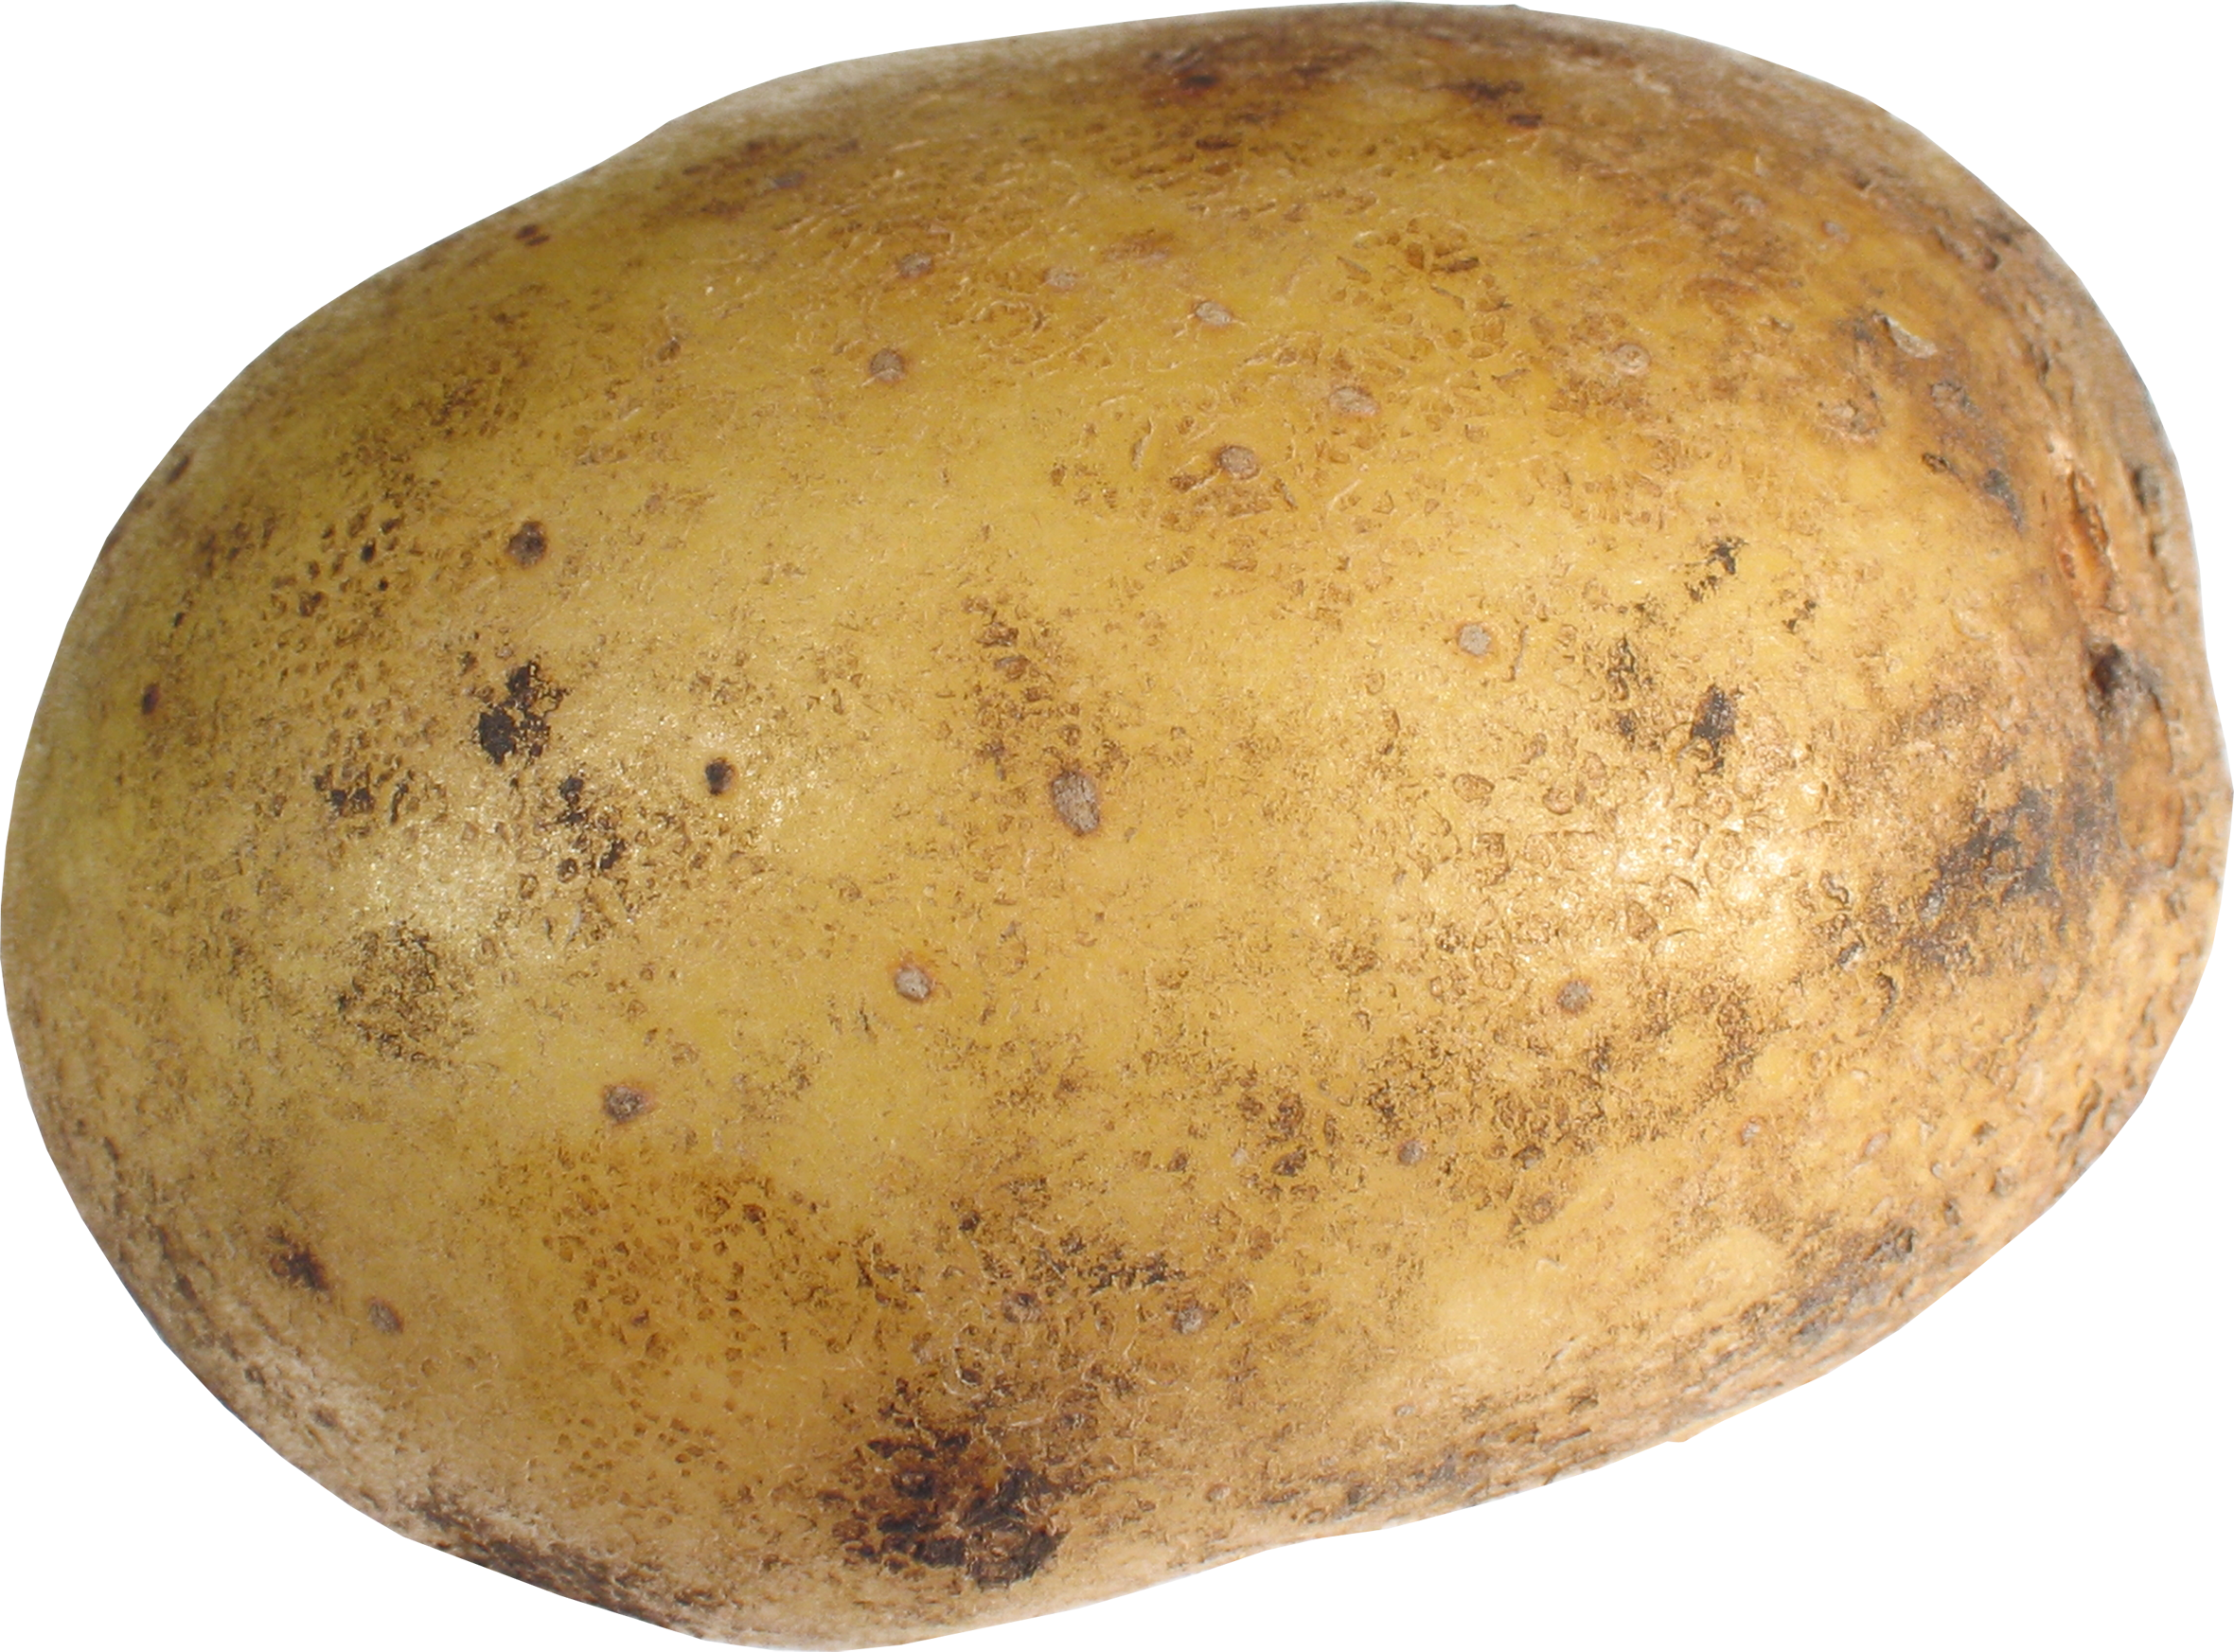 Potato clipart. Png images panda free